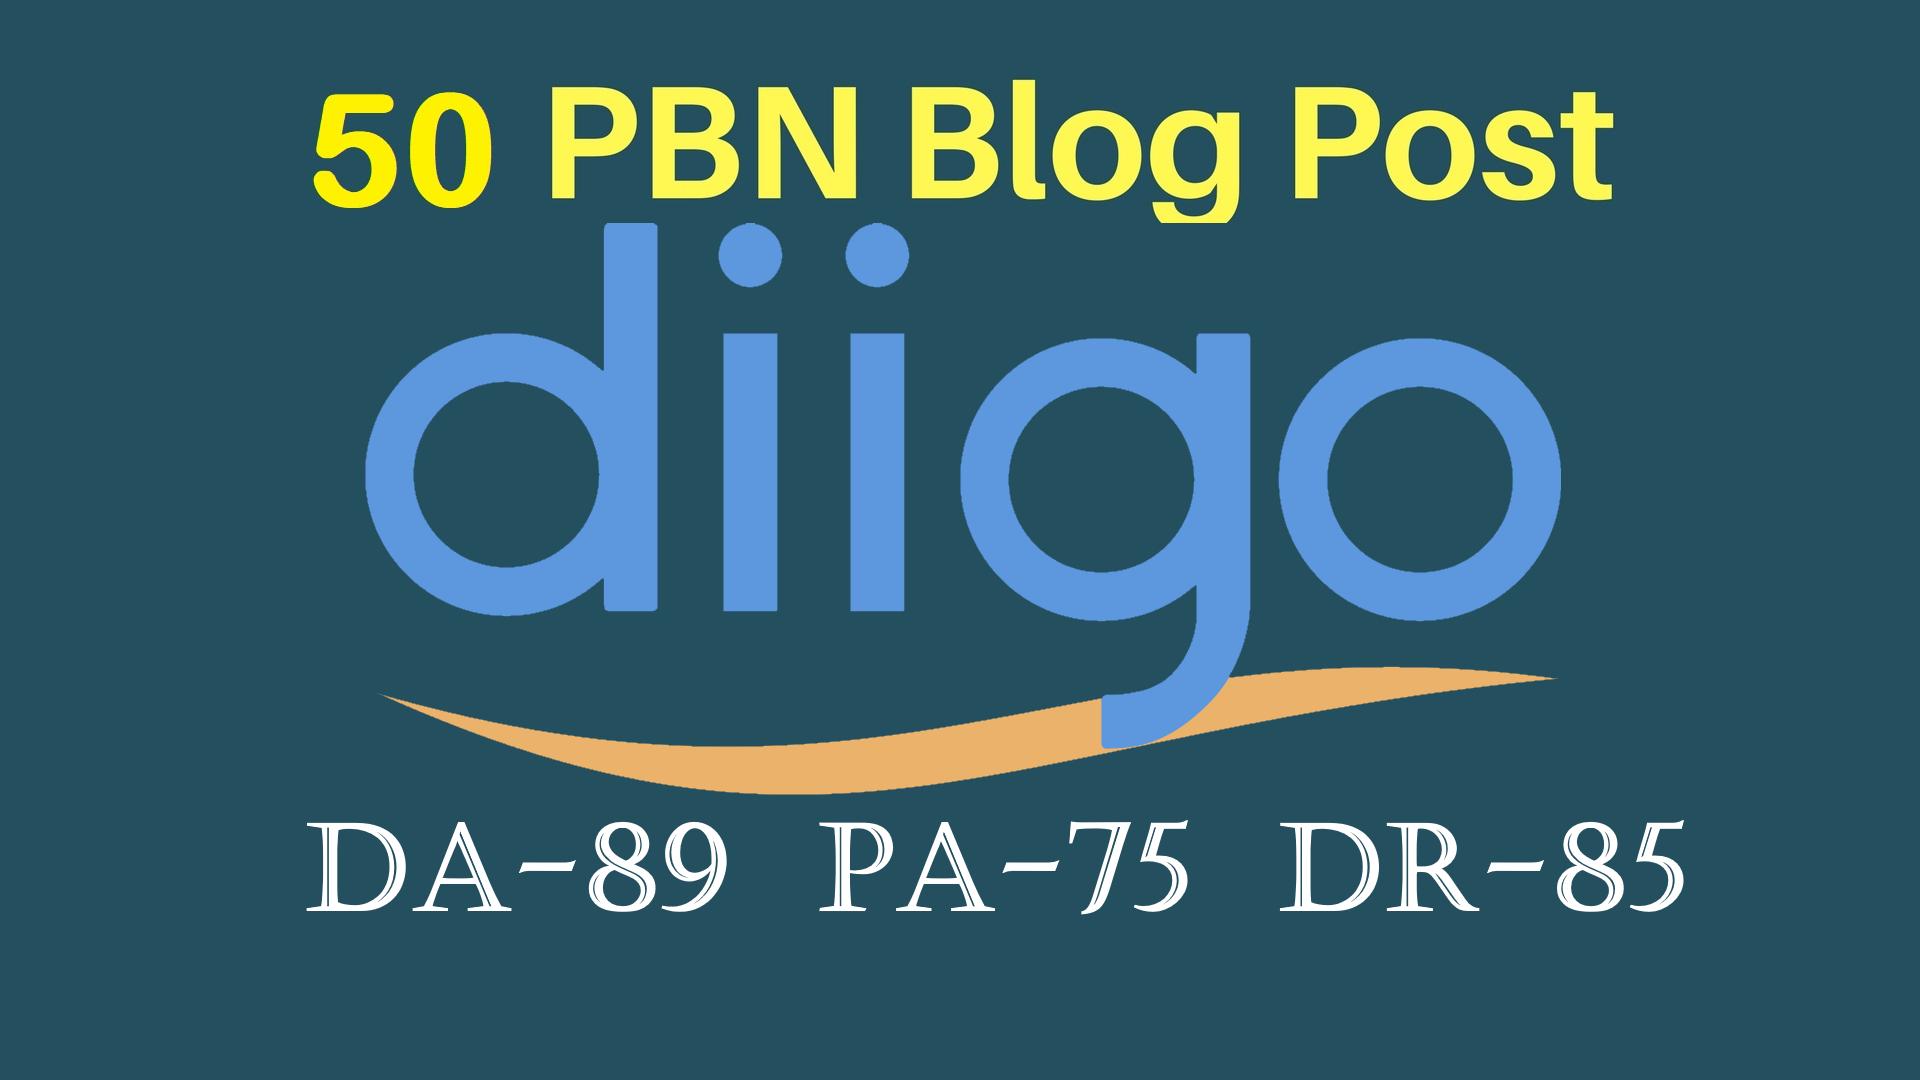 50+ PBN Diigo Dofollow Backlinks DA-89 PA-75 DR-85 Buy 3 Get 1 Free For casino,  Poker and other